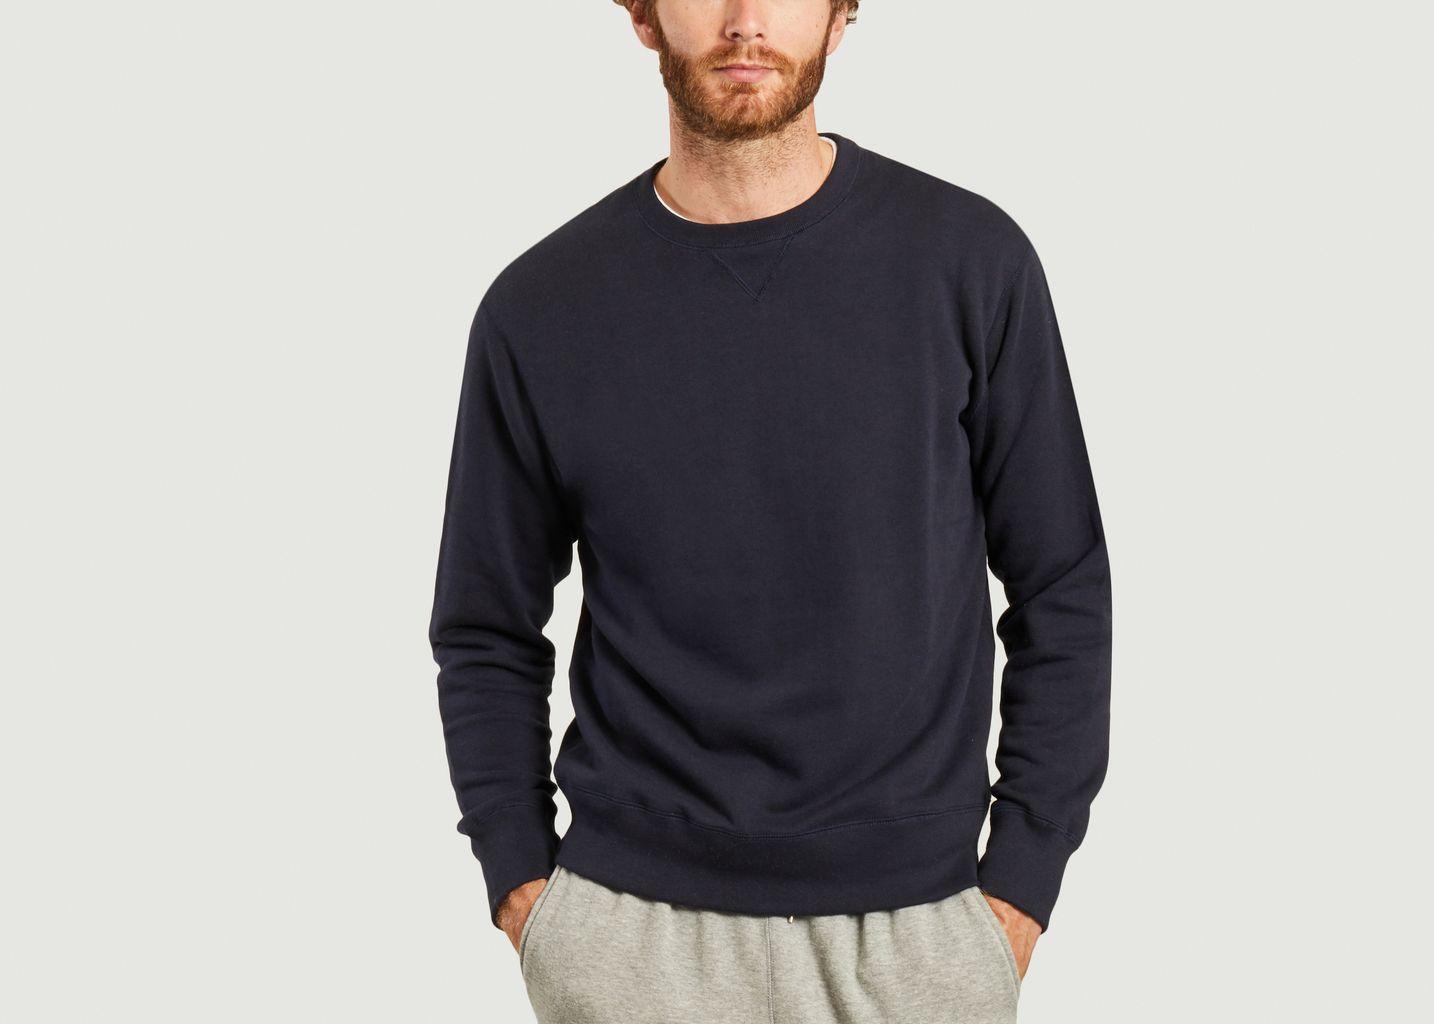 Sweatshirt Loopwheel fabriqué au Japon - MocT